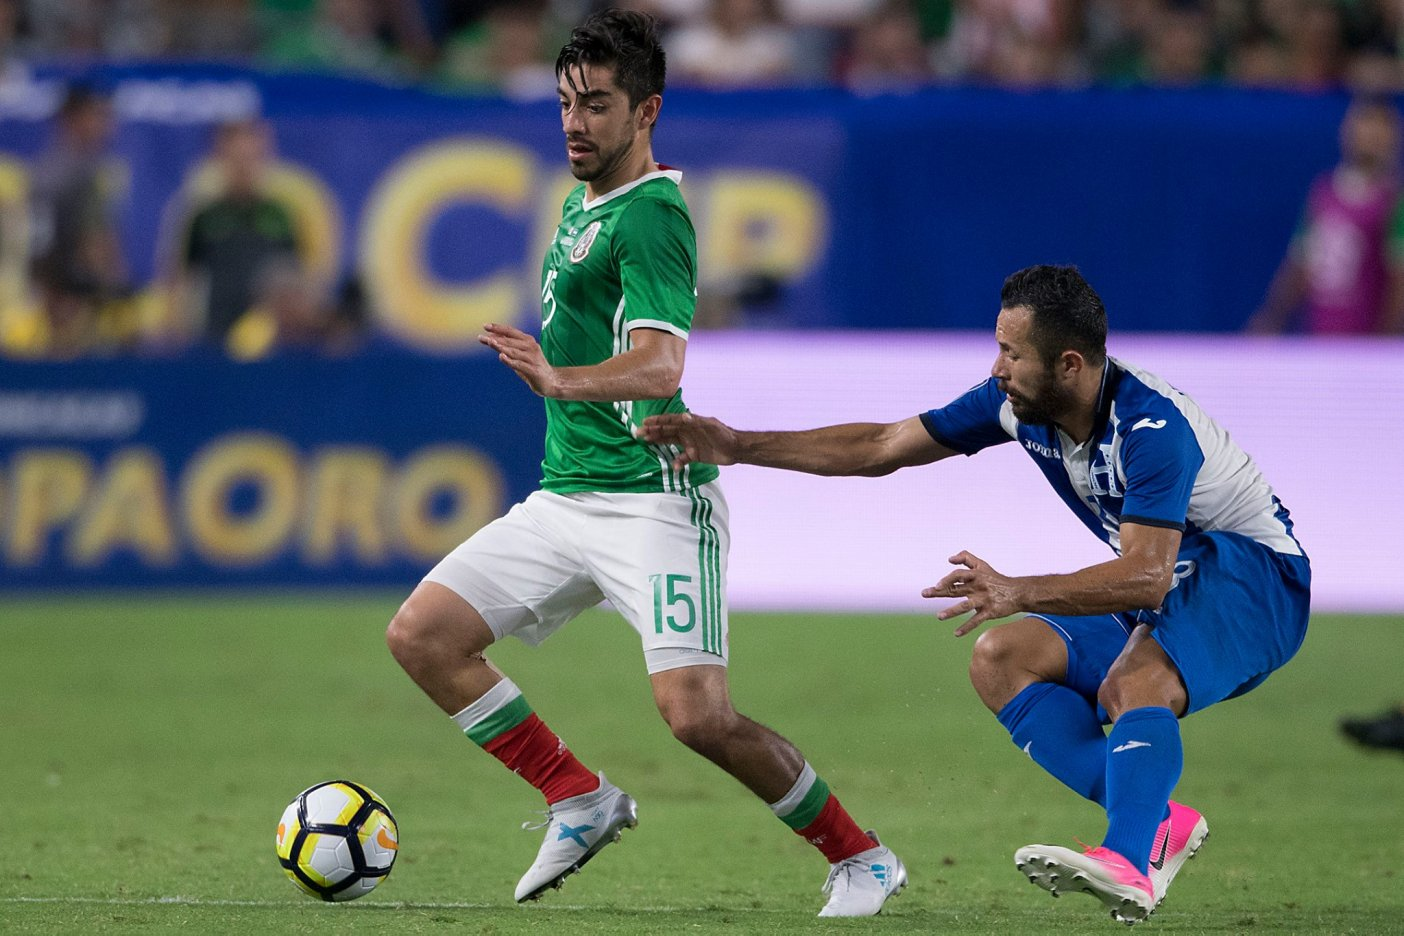 Resultado México vs Honduras Cuartos de final Copa Oro 2017